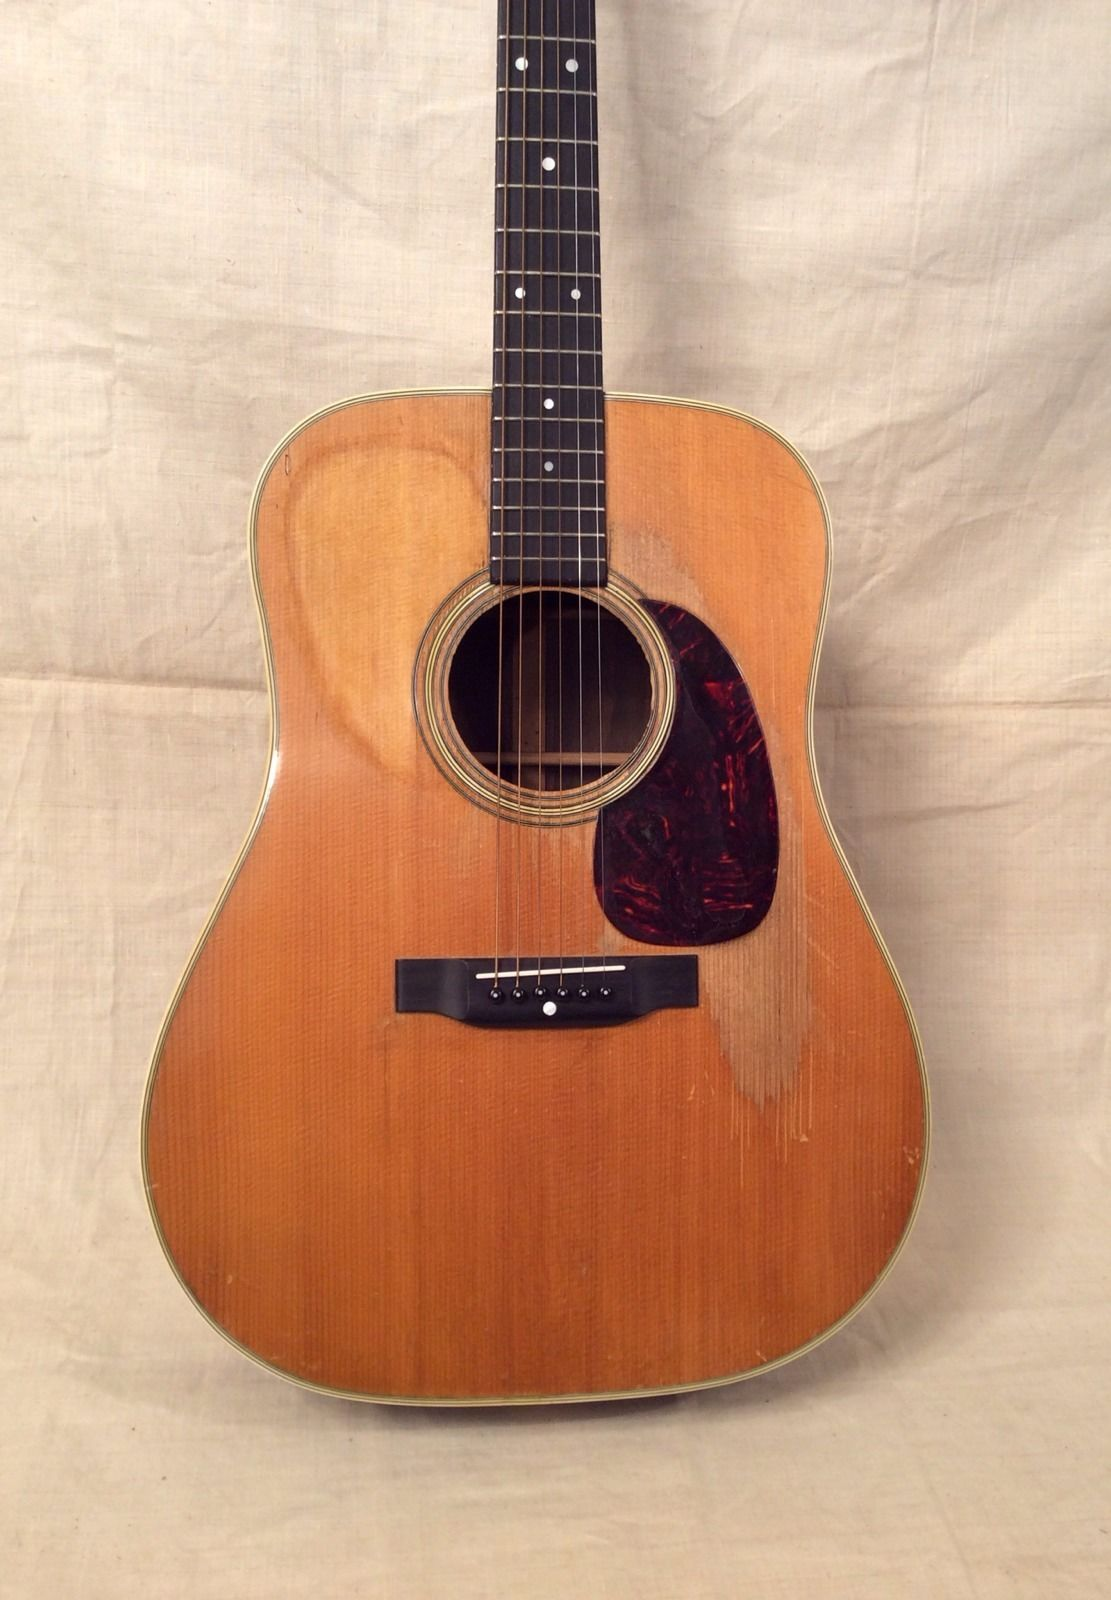 Vintage 1961 Martin D 28 Acoustic Guitar 1960 S C F Martin Co Martin Acoustic Guitar Vintage Music Guitar